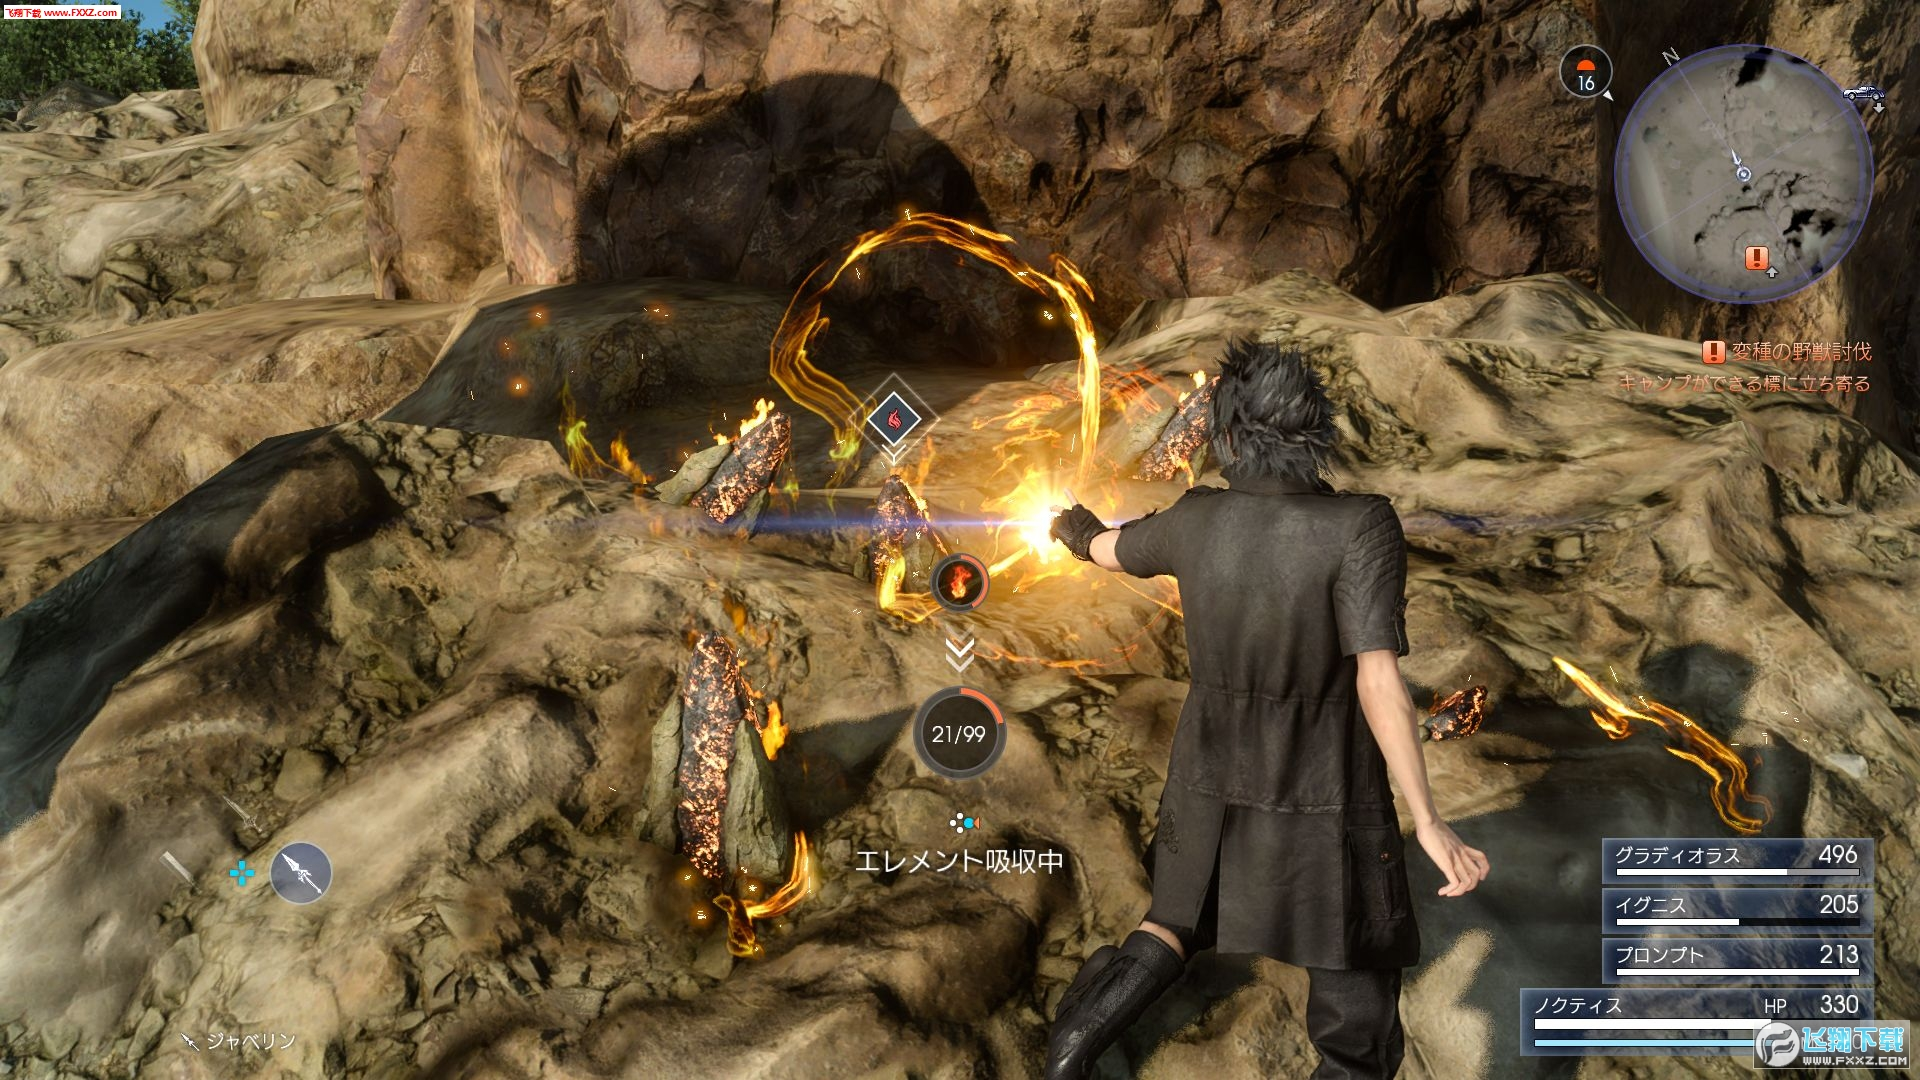 最终幻想15 Final Fantasy XV截图1